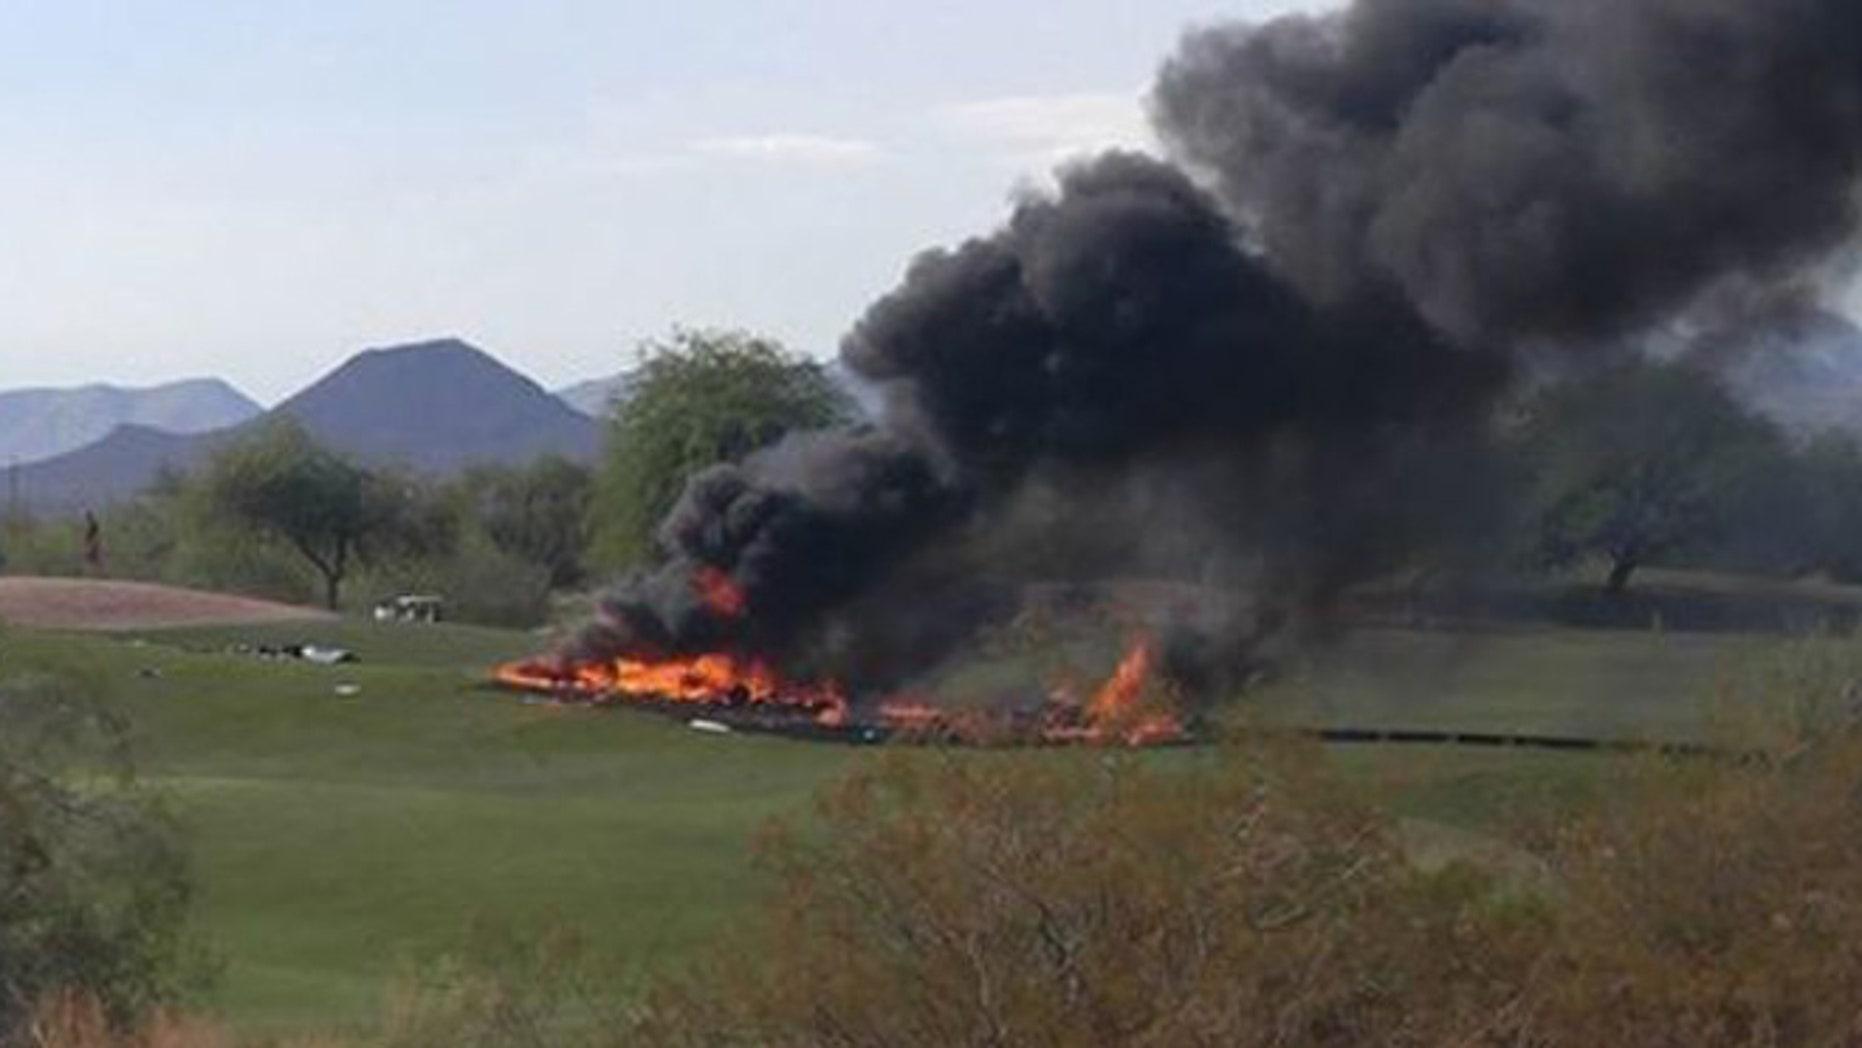 Two people were killed in a plane crash in Mesa, Arizona Monday.